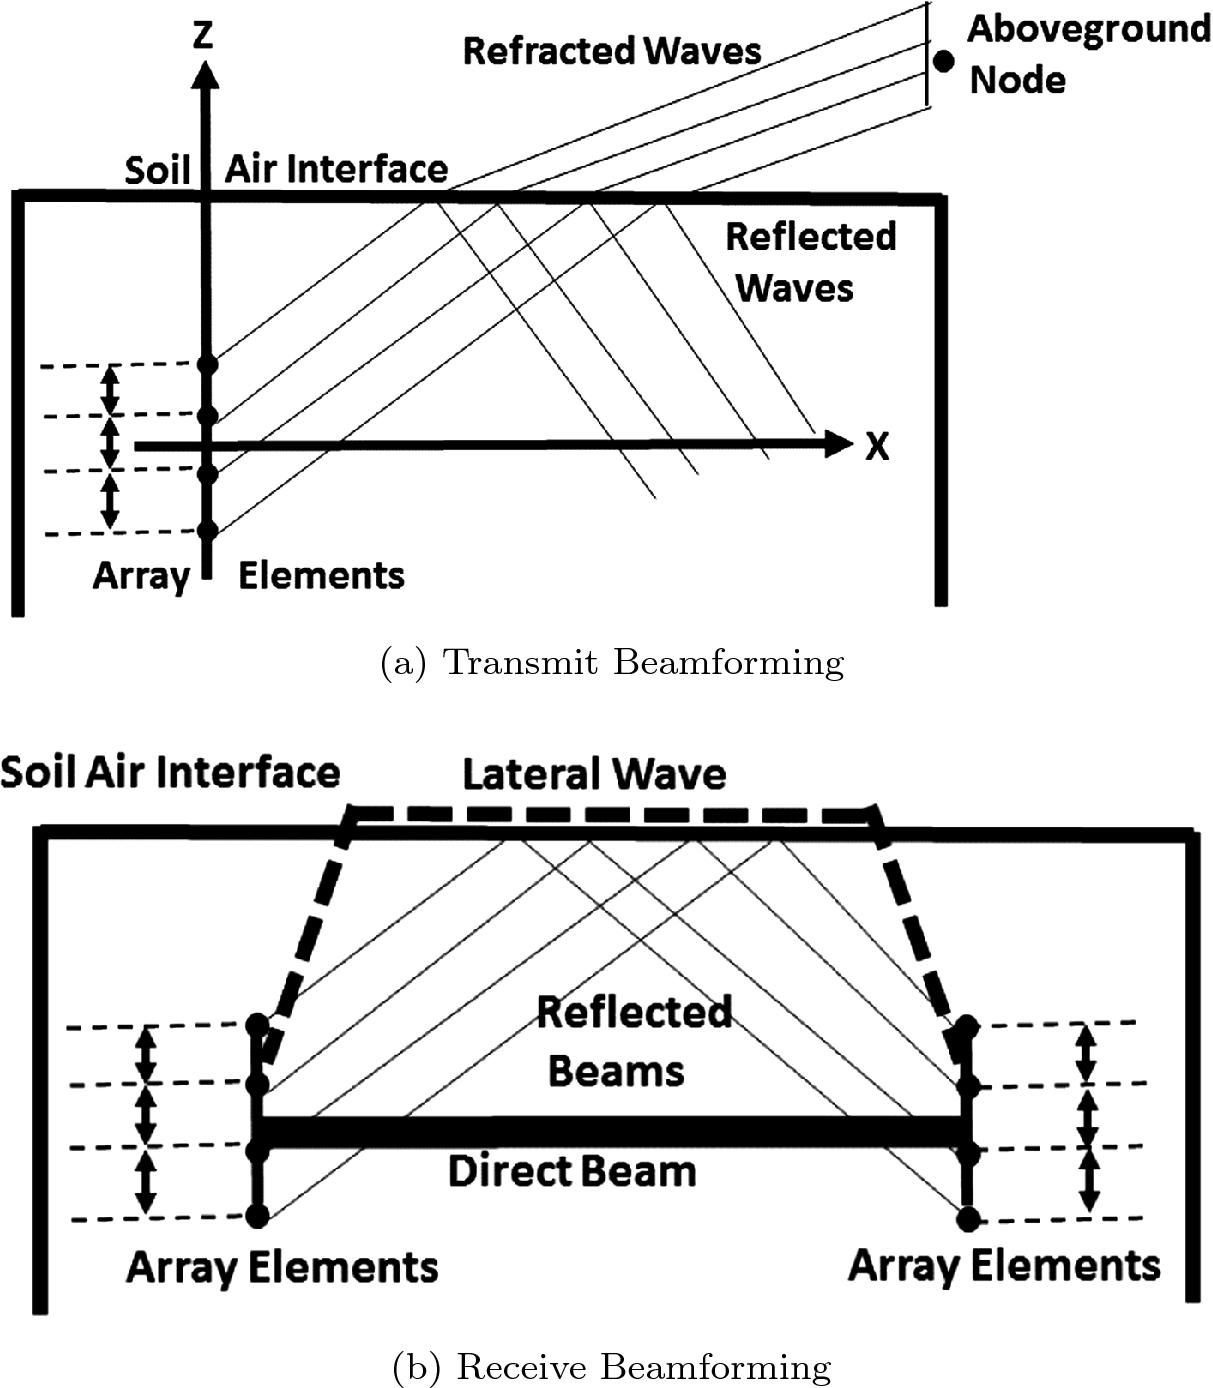 Underground Environment Aware MIMO Design Using Transmit and